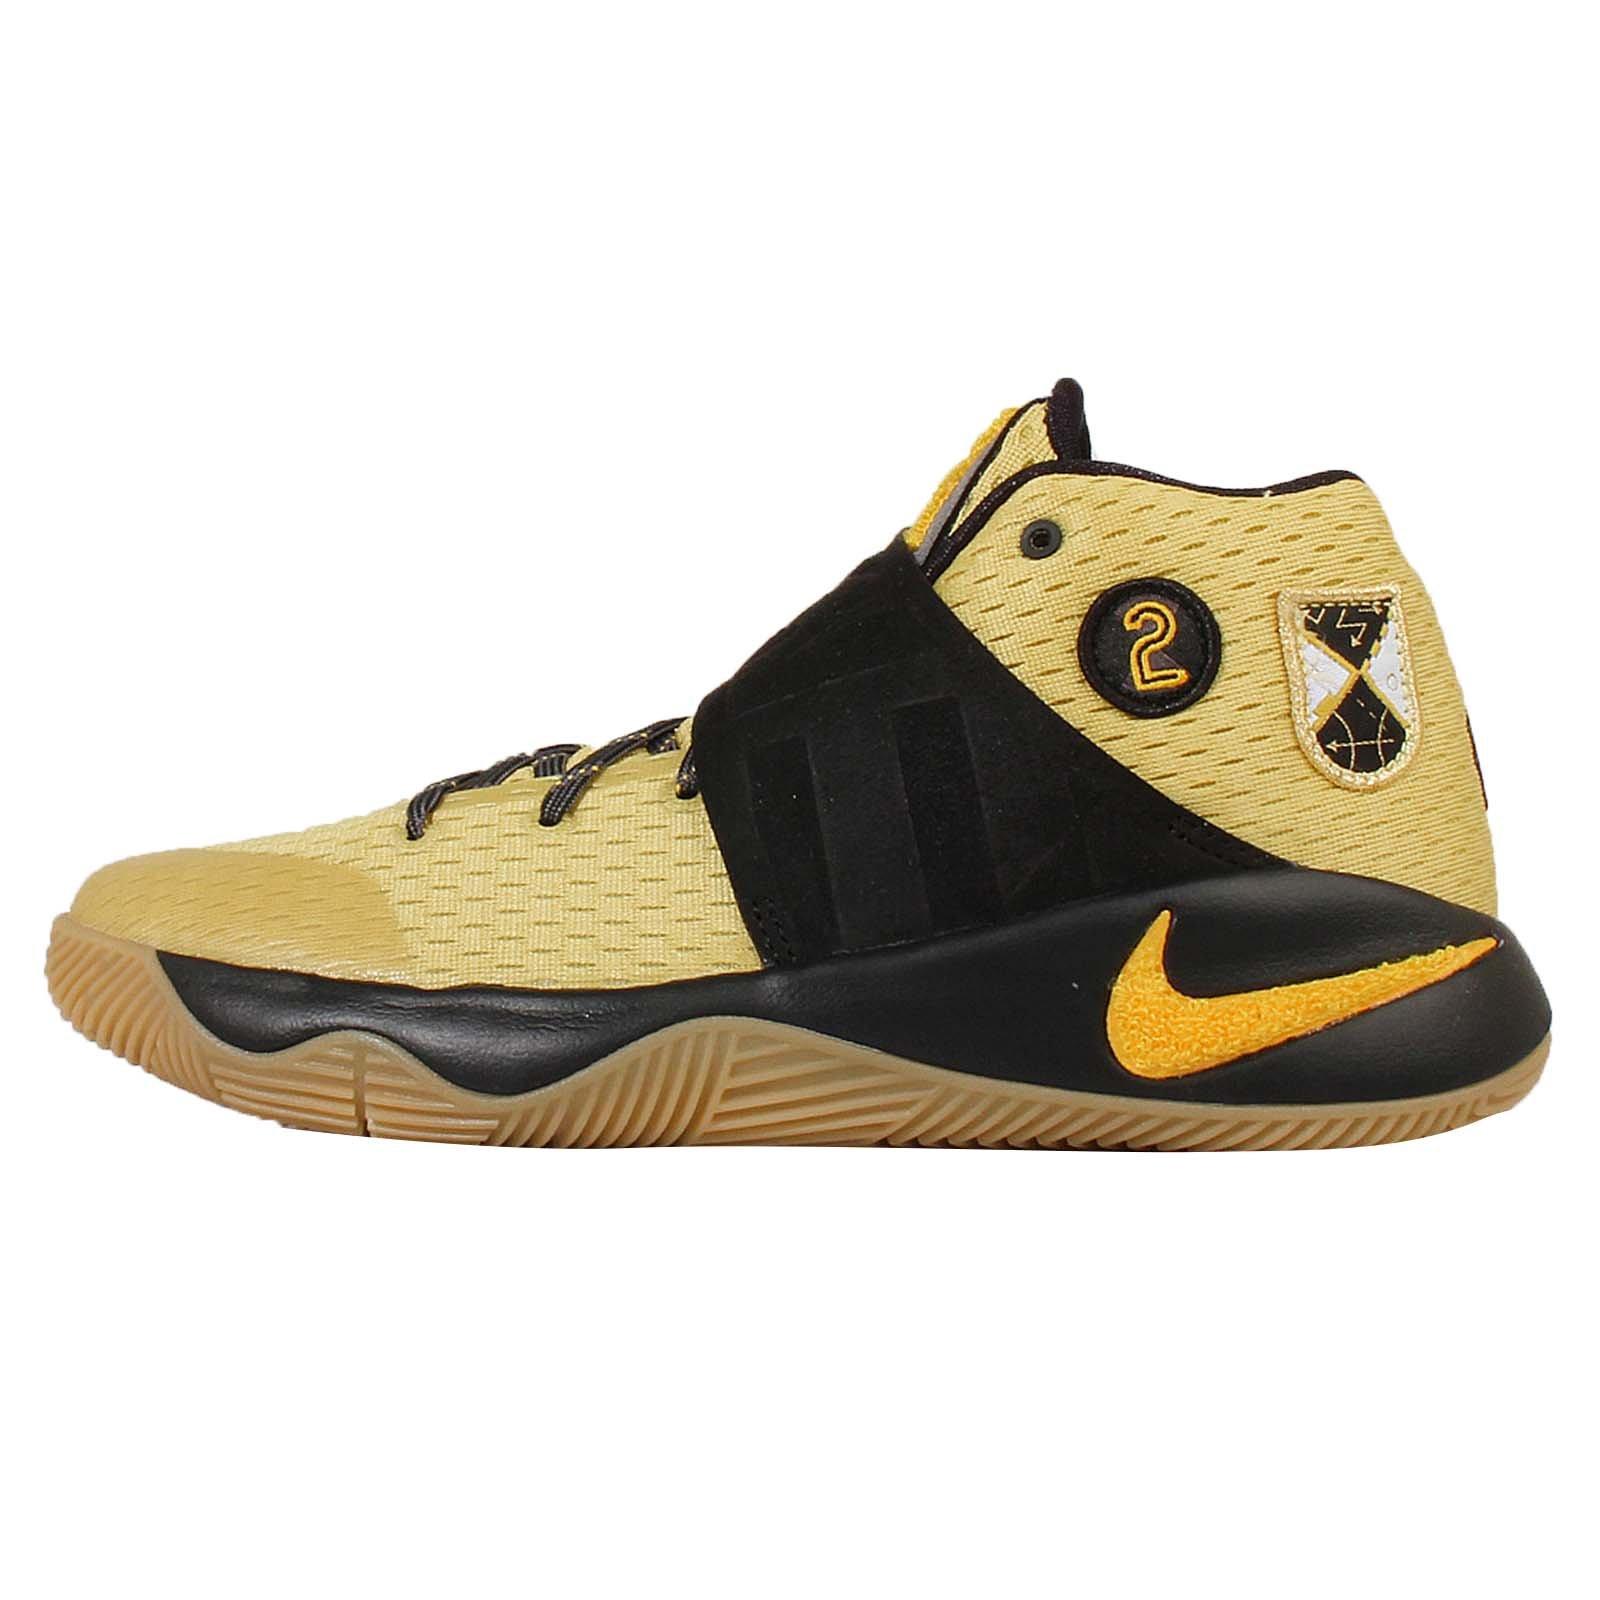 Nike Kids Kyrie 2 AS GS, ALL STAR-CELERY/VARSITY MAIZE-BLACK, Youth Size 6 by Nike (Image #1)